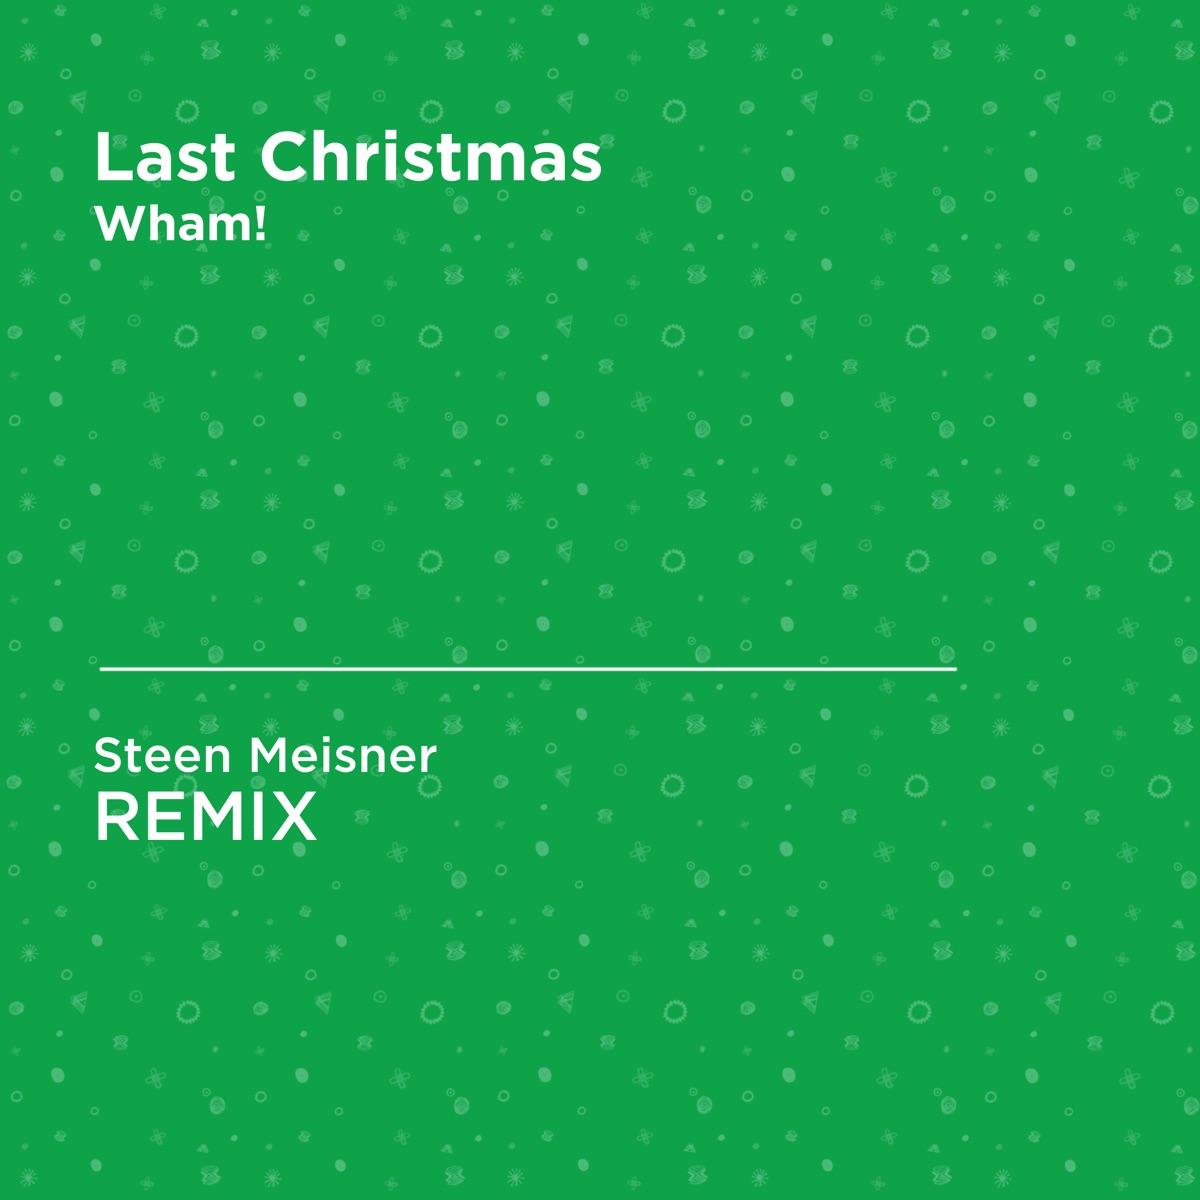 Last Christmas Album Cover.Last Christmas Album Cover By Steen Meisner